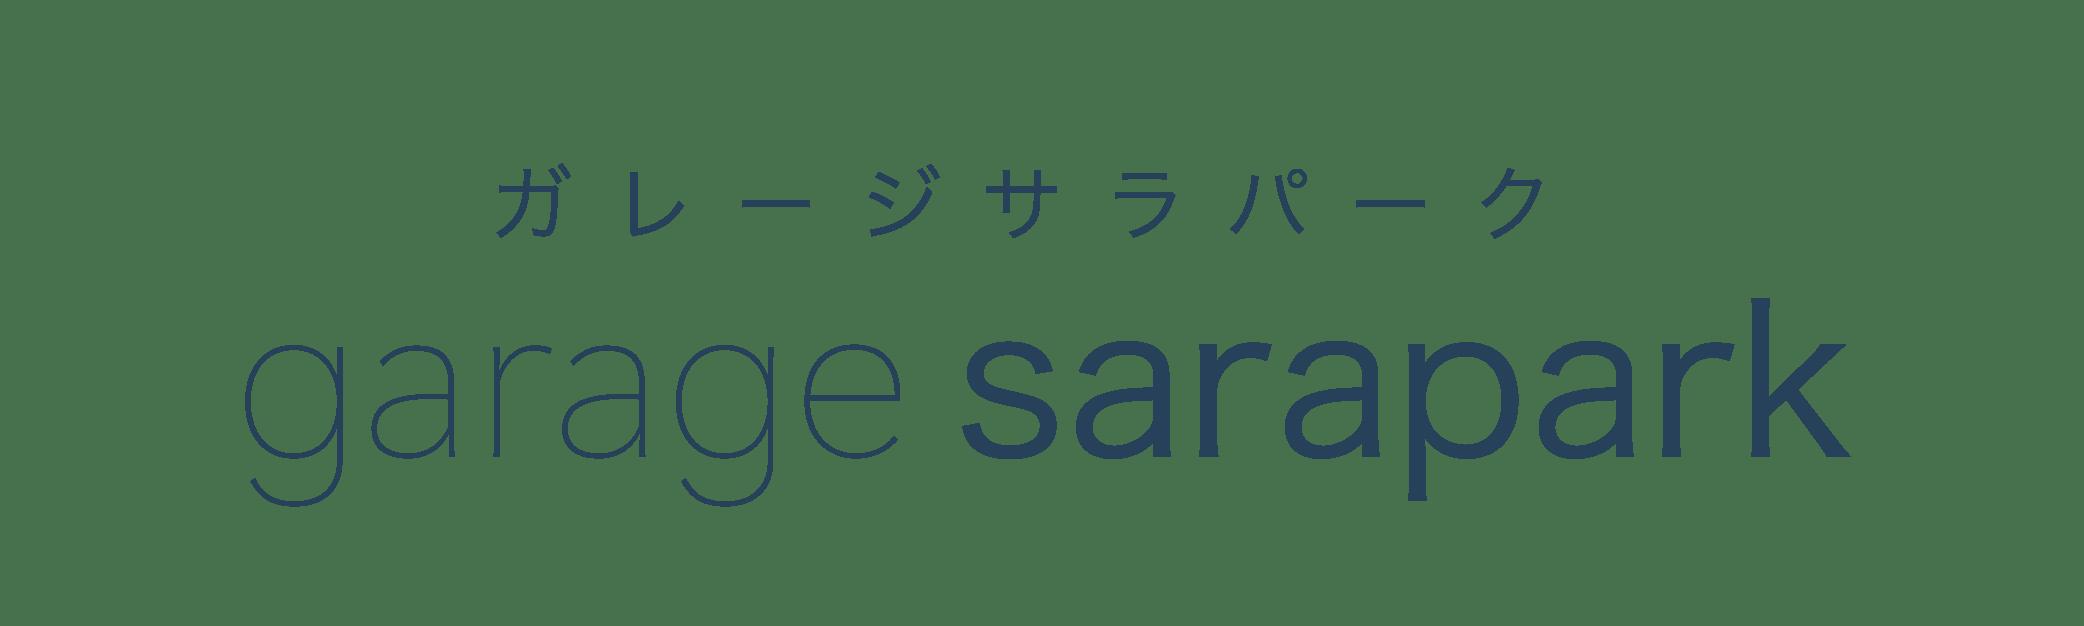 garage sarapark(ガレージサラパーク)